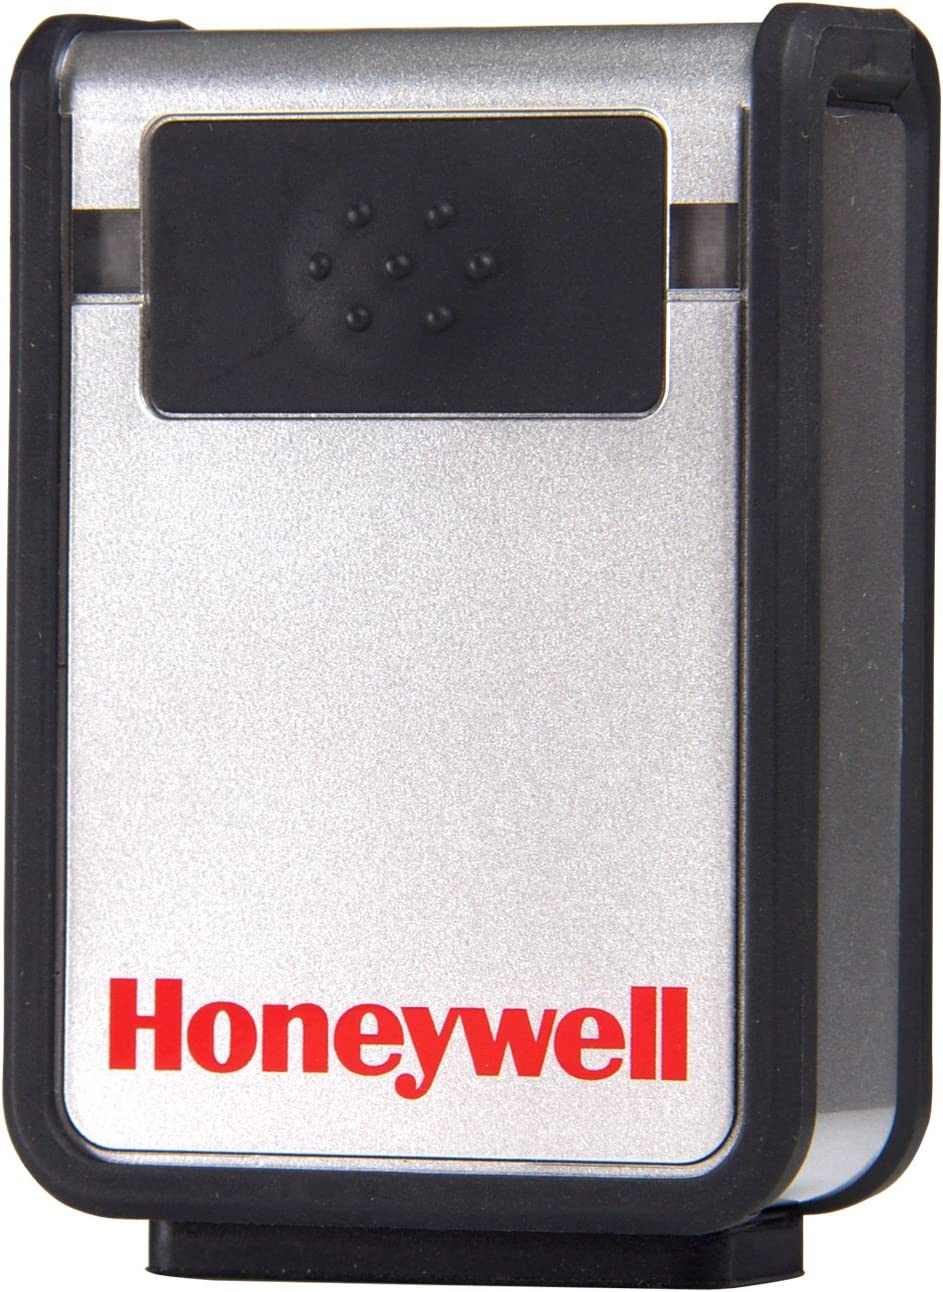 VUQUEST 3310G 2D Scanner USB Kit